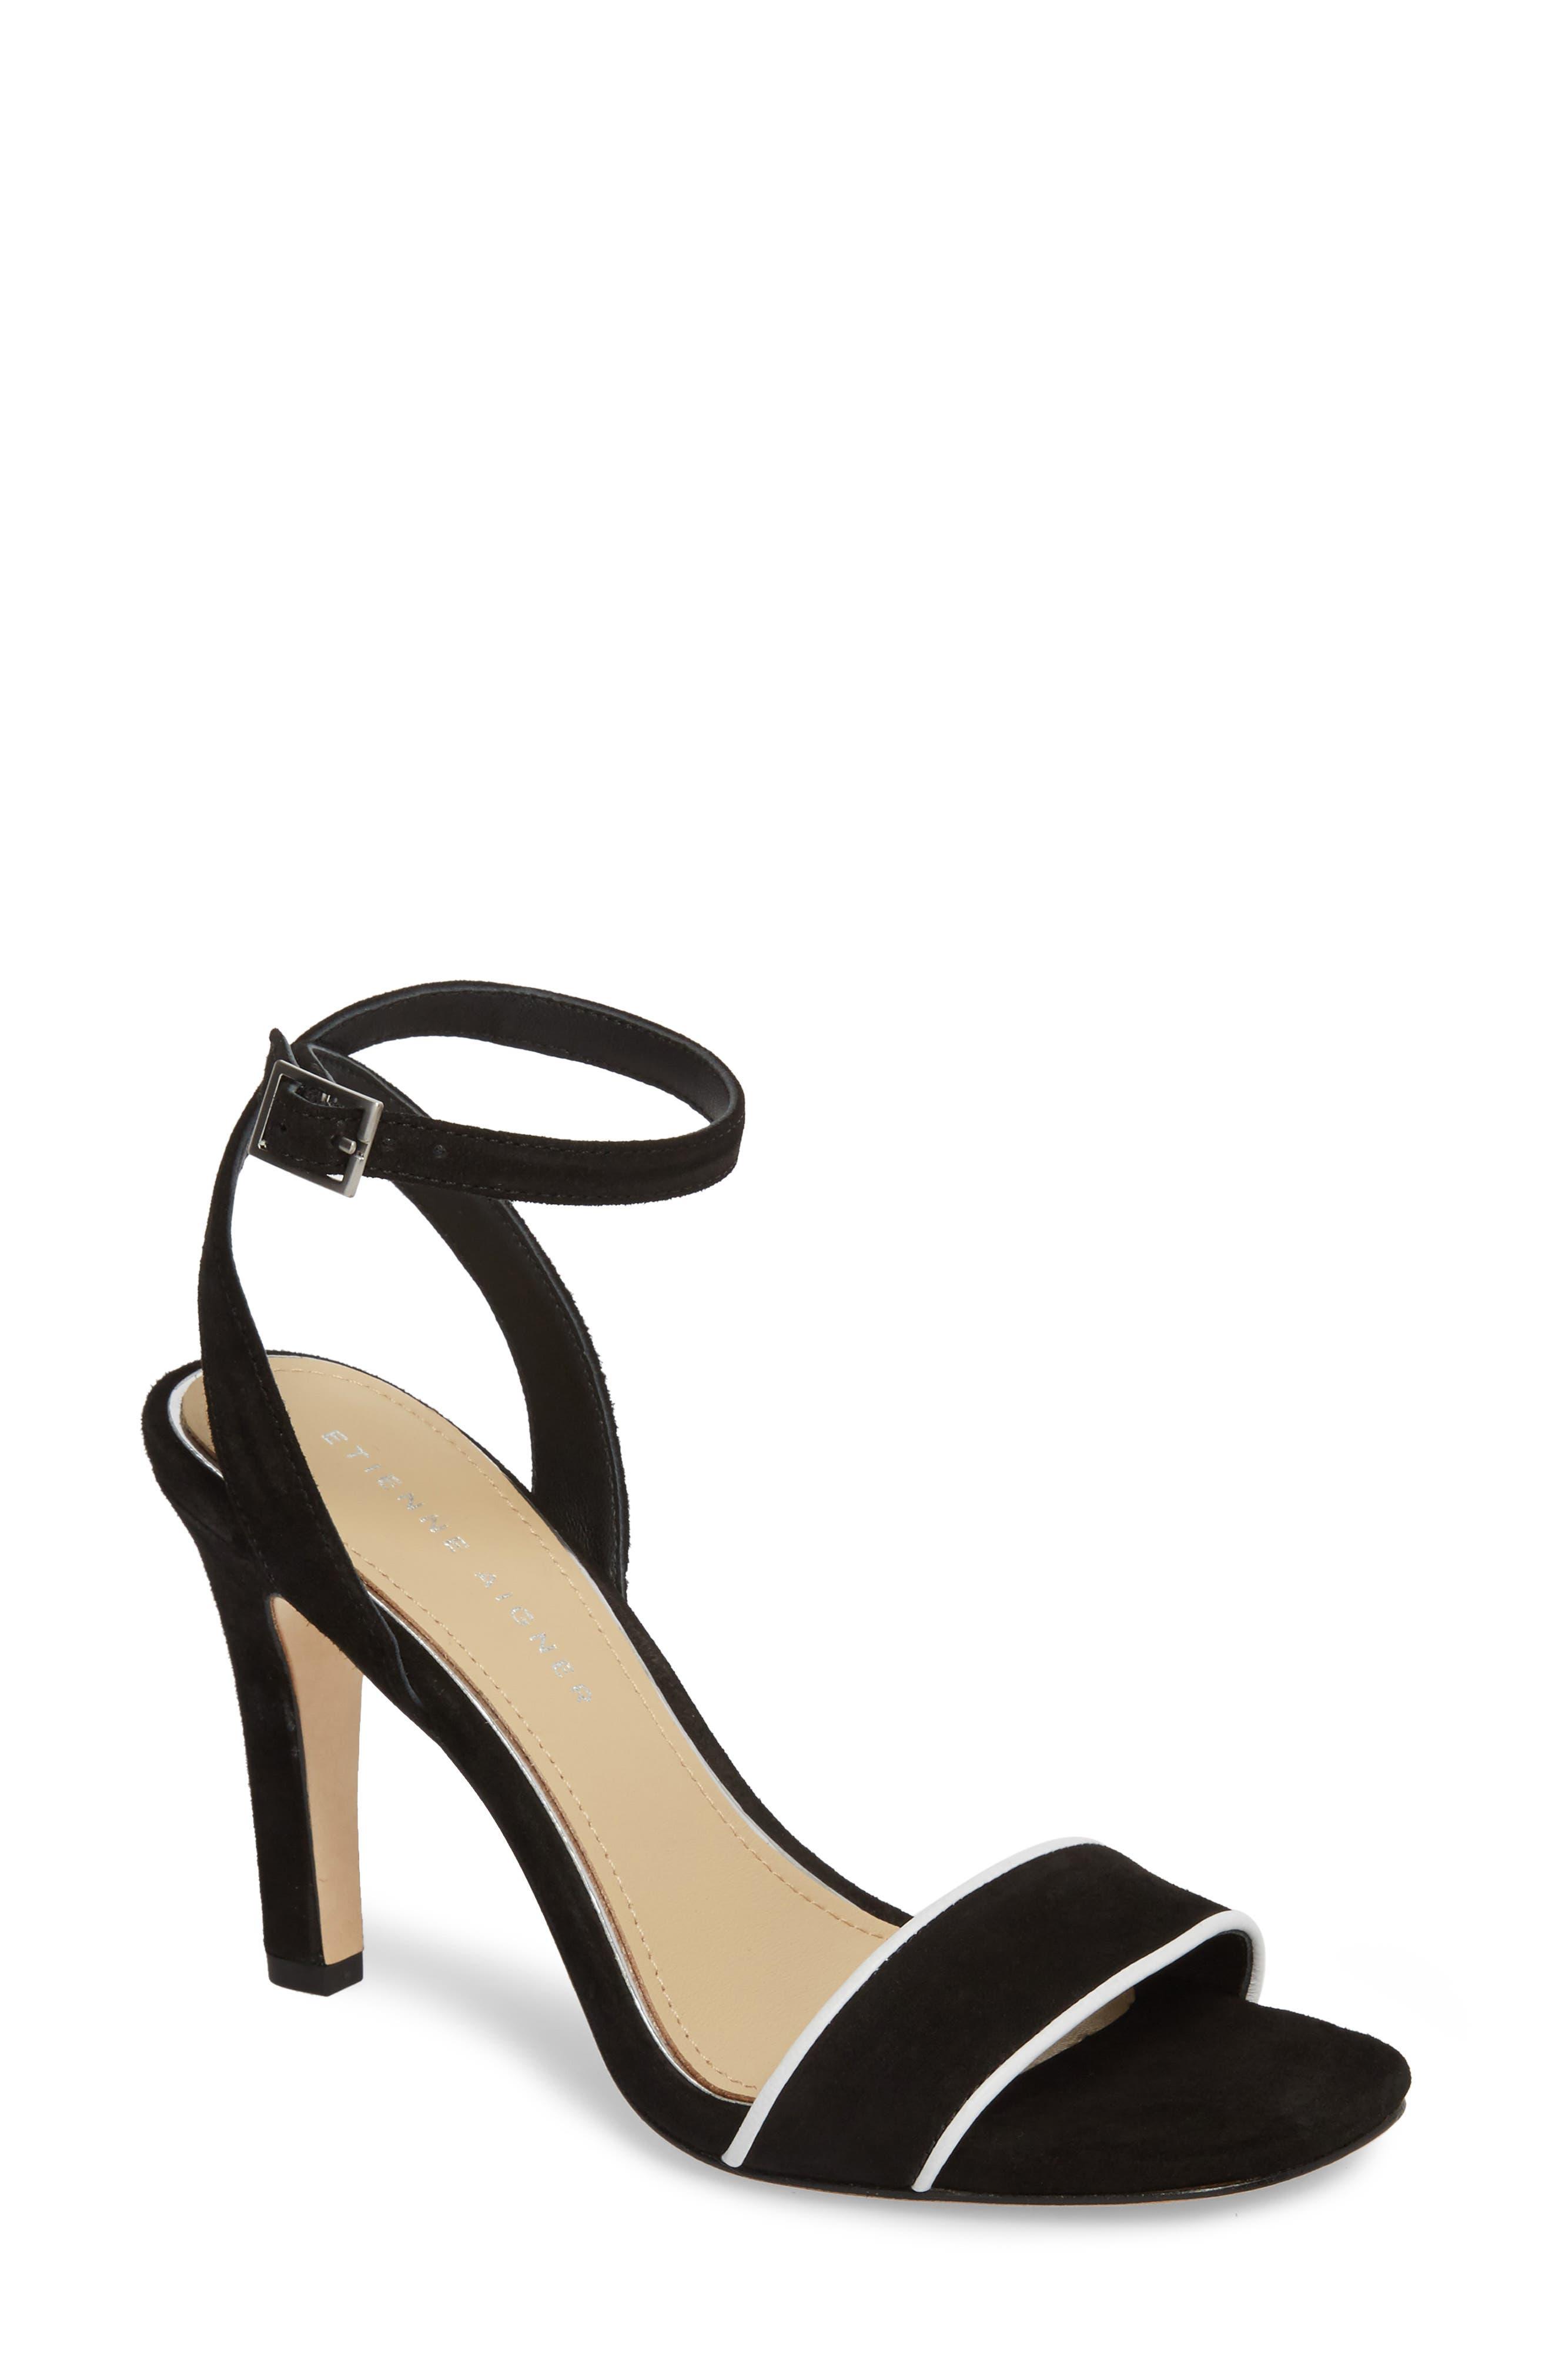 Martini Sandal,                             Main thumbnail 1, color,                             BLACK/ WHITE SUEDE